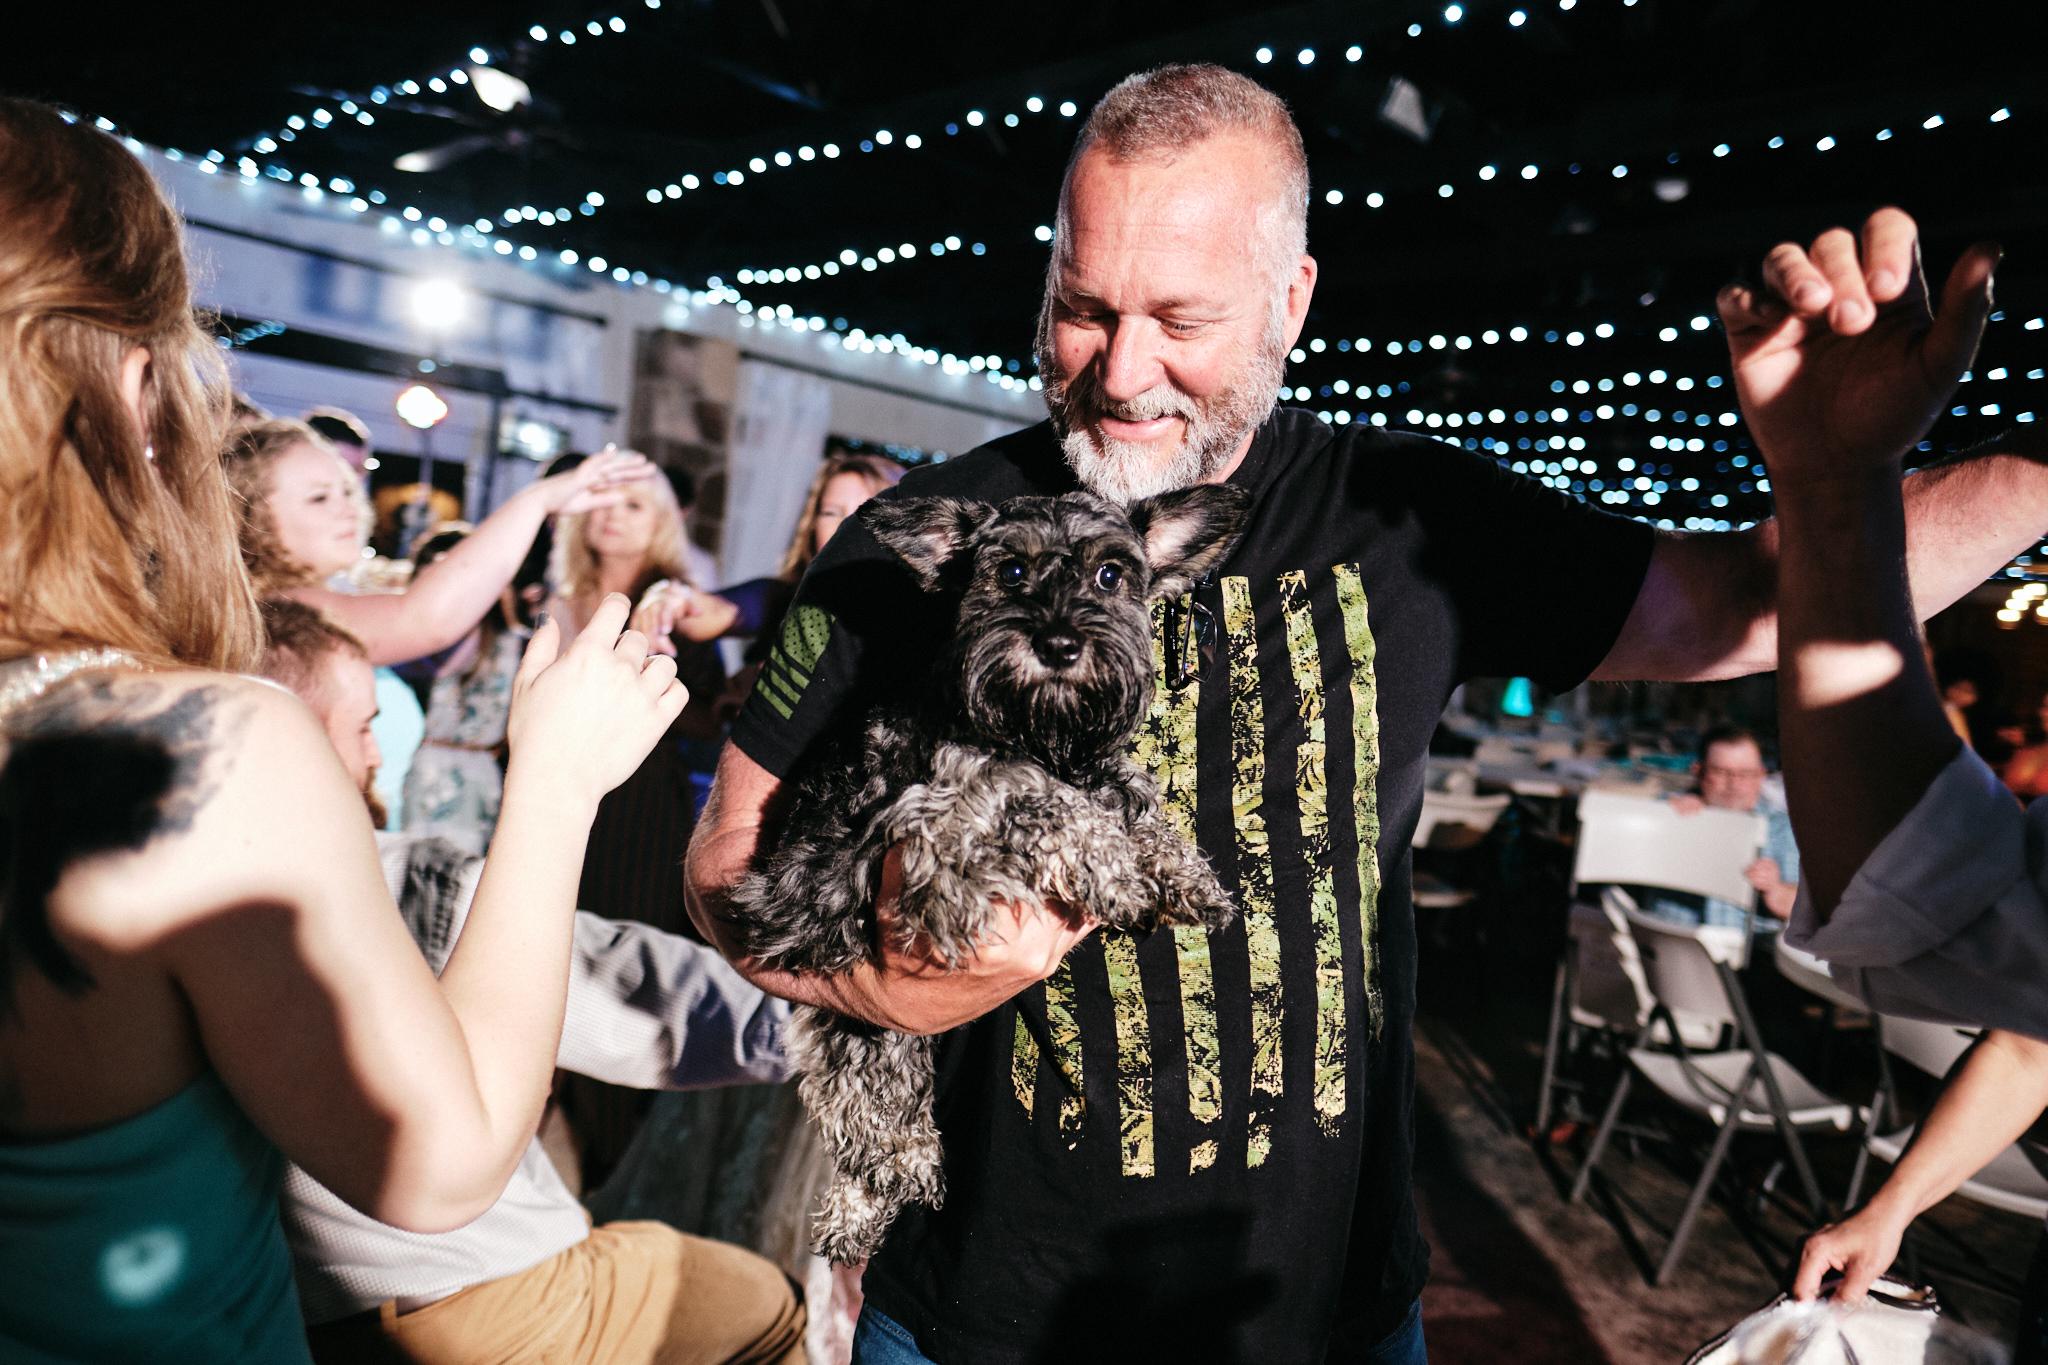 Dog on the dance floor